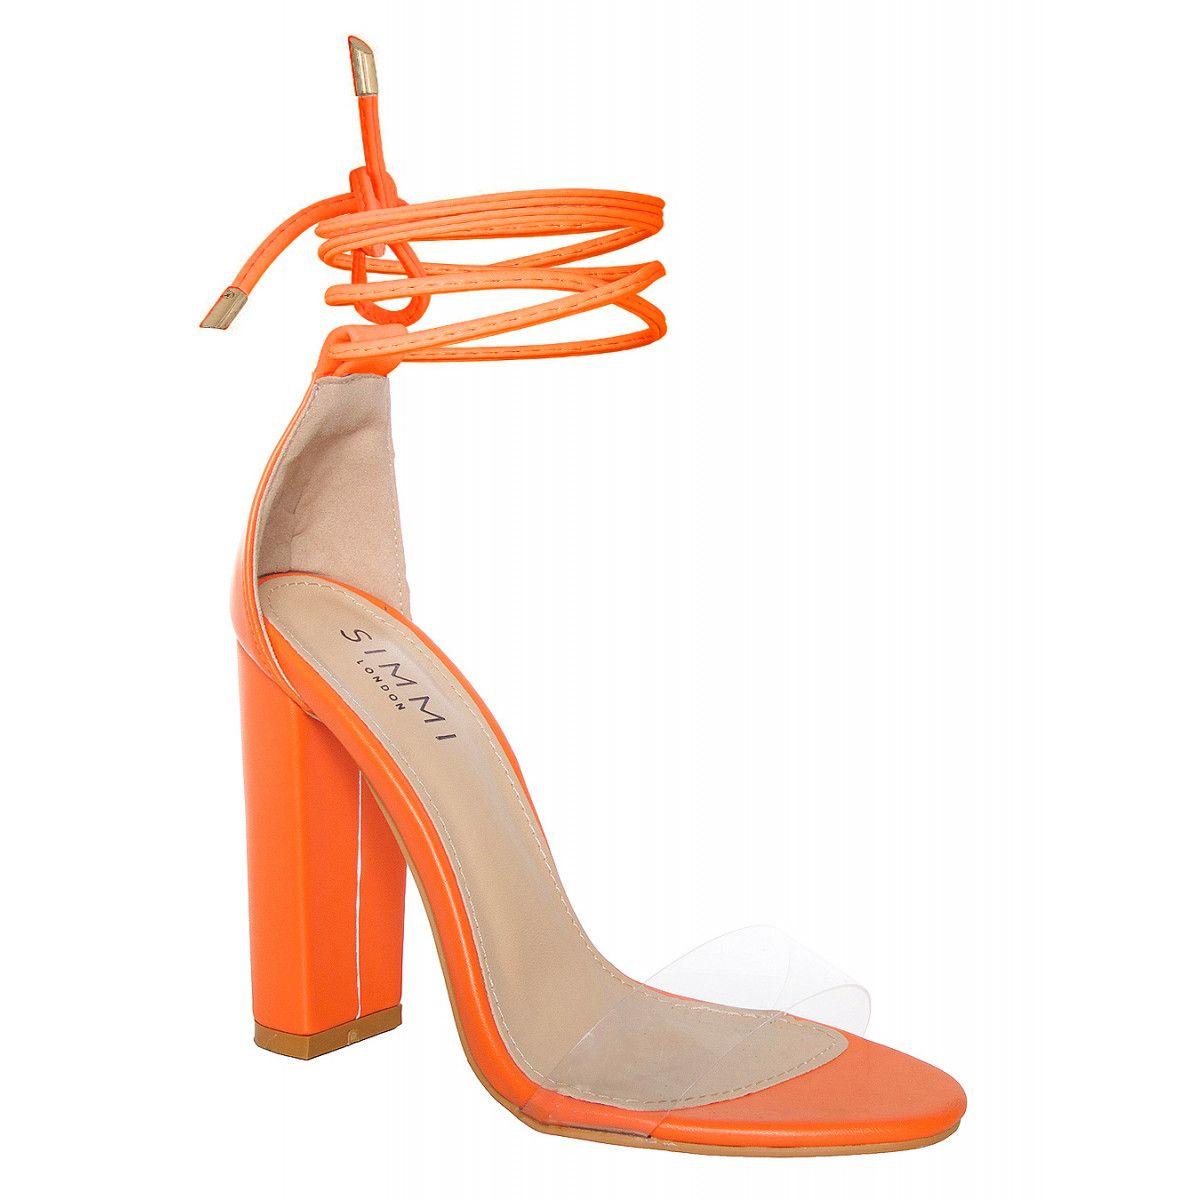 b5f911b891a Harley Orange Transparent Lace Up Block Heels : Simmi Shoes | Shoes ...